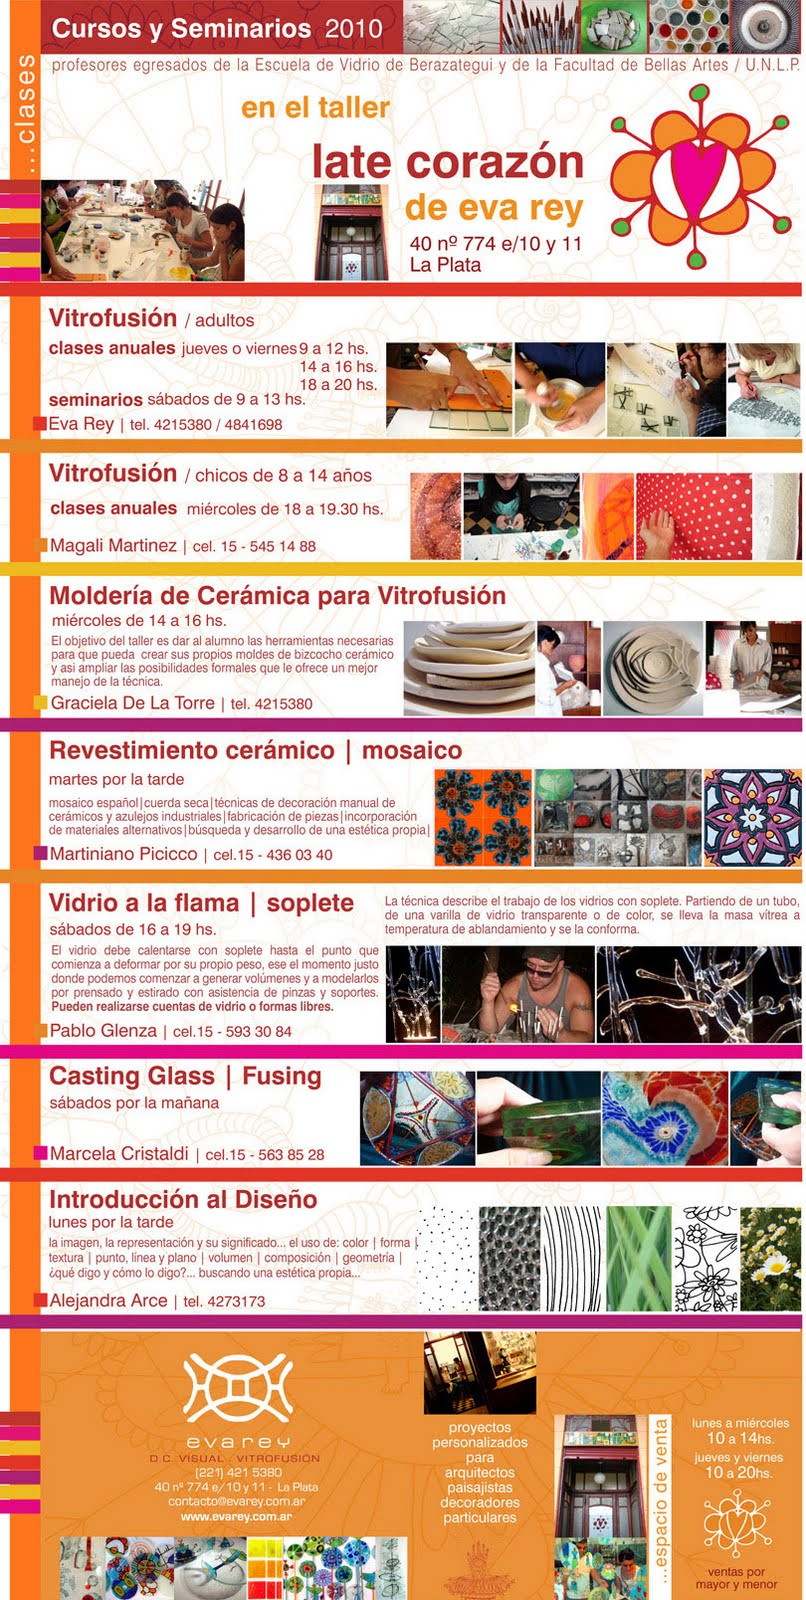 http://2.bp.blogspot.com/_Obsfun0tZDU/S7-zASxjEOI/AAAAAAAARdU/cxoX2PvQo5E/s1600/MAILING-CURSOS-SEMINARIOS-2010.jpg